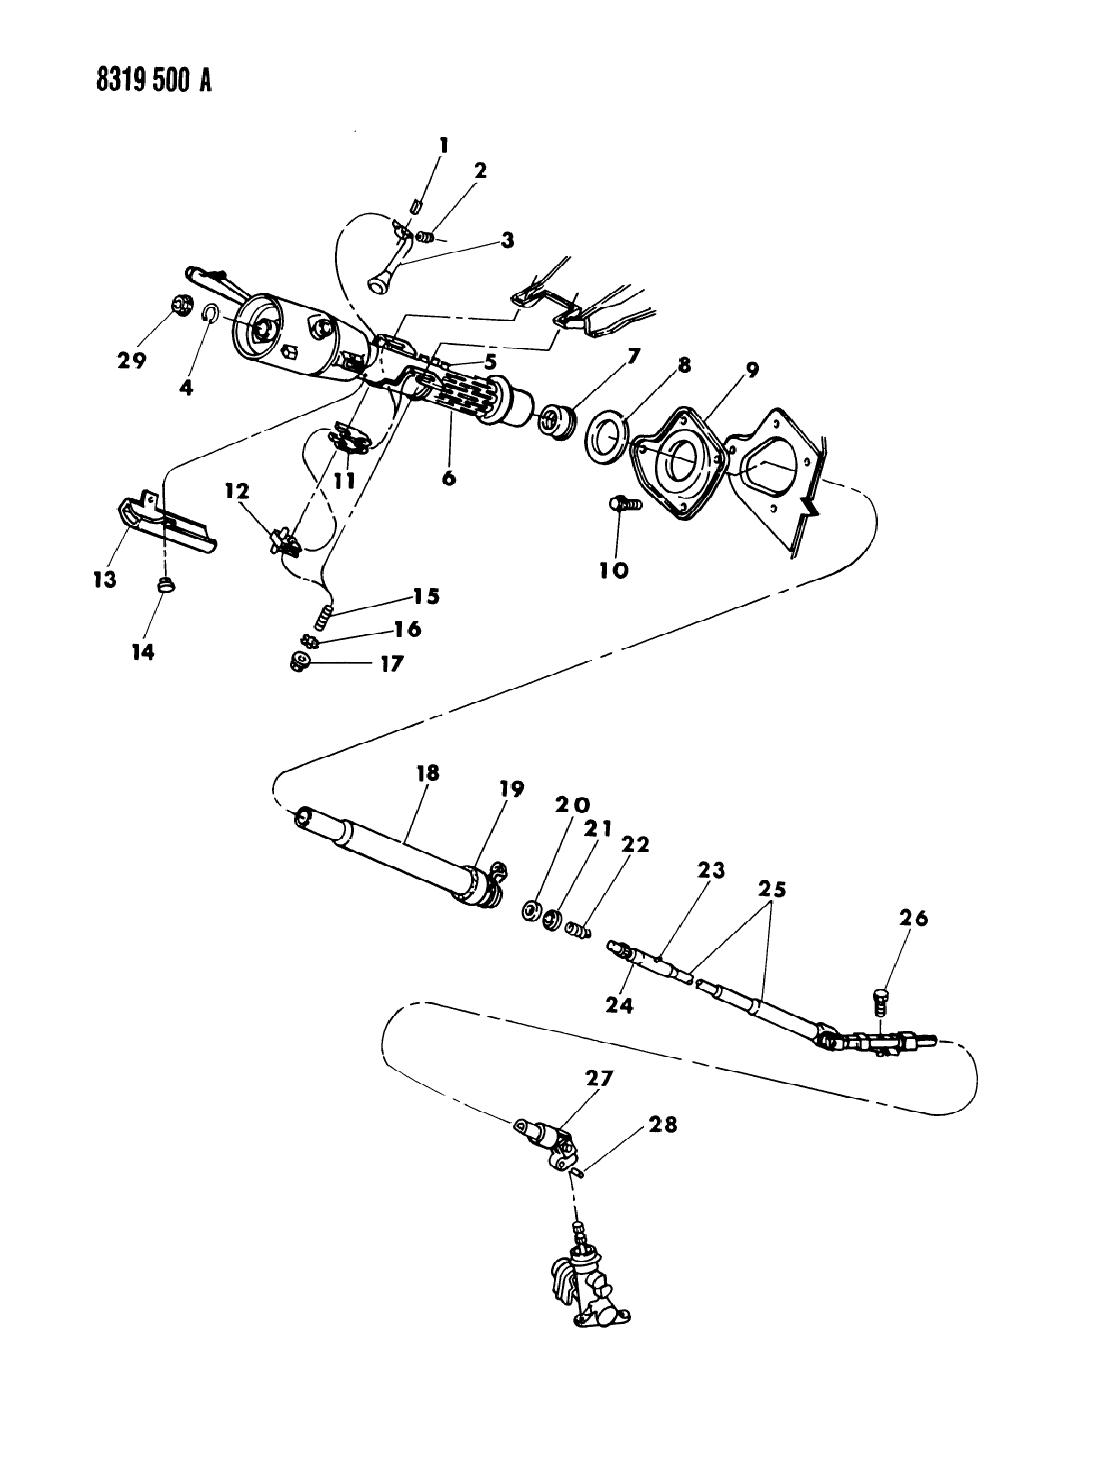 1989 dodge dakota column, steering without tilt lower1989 Dodge Dakota Steering Column Diagram #7